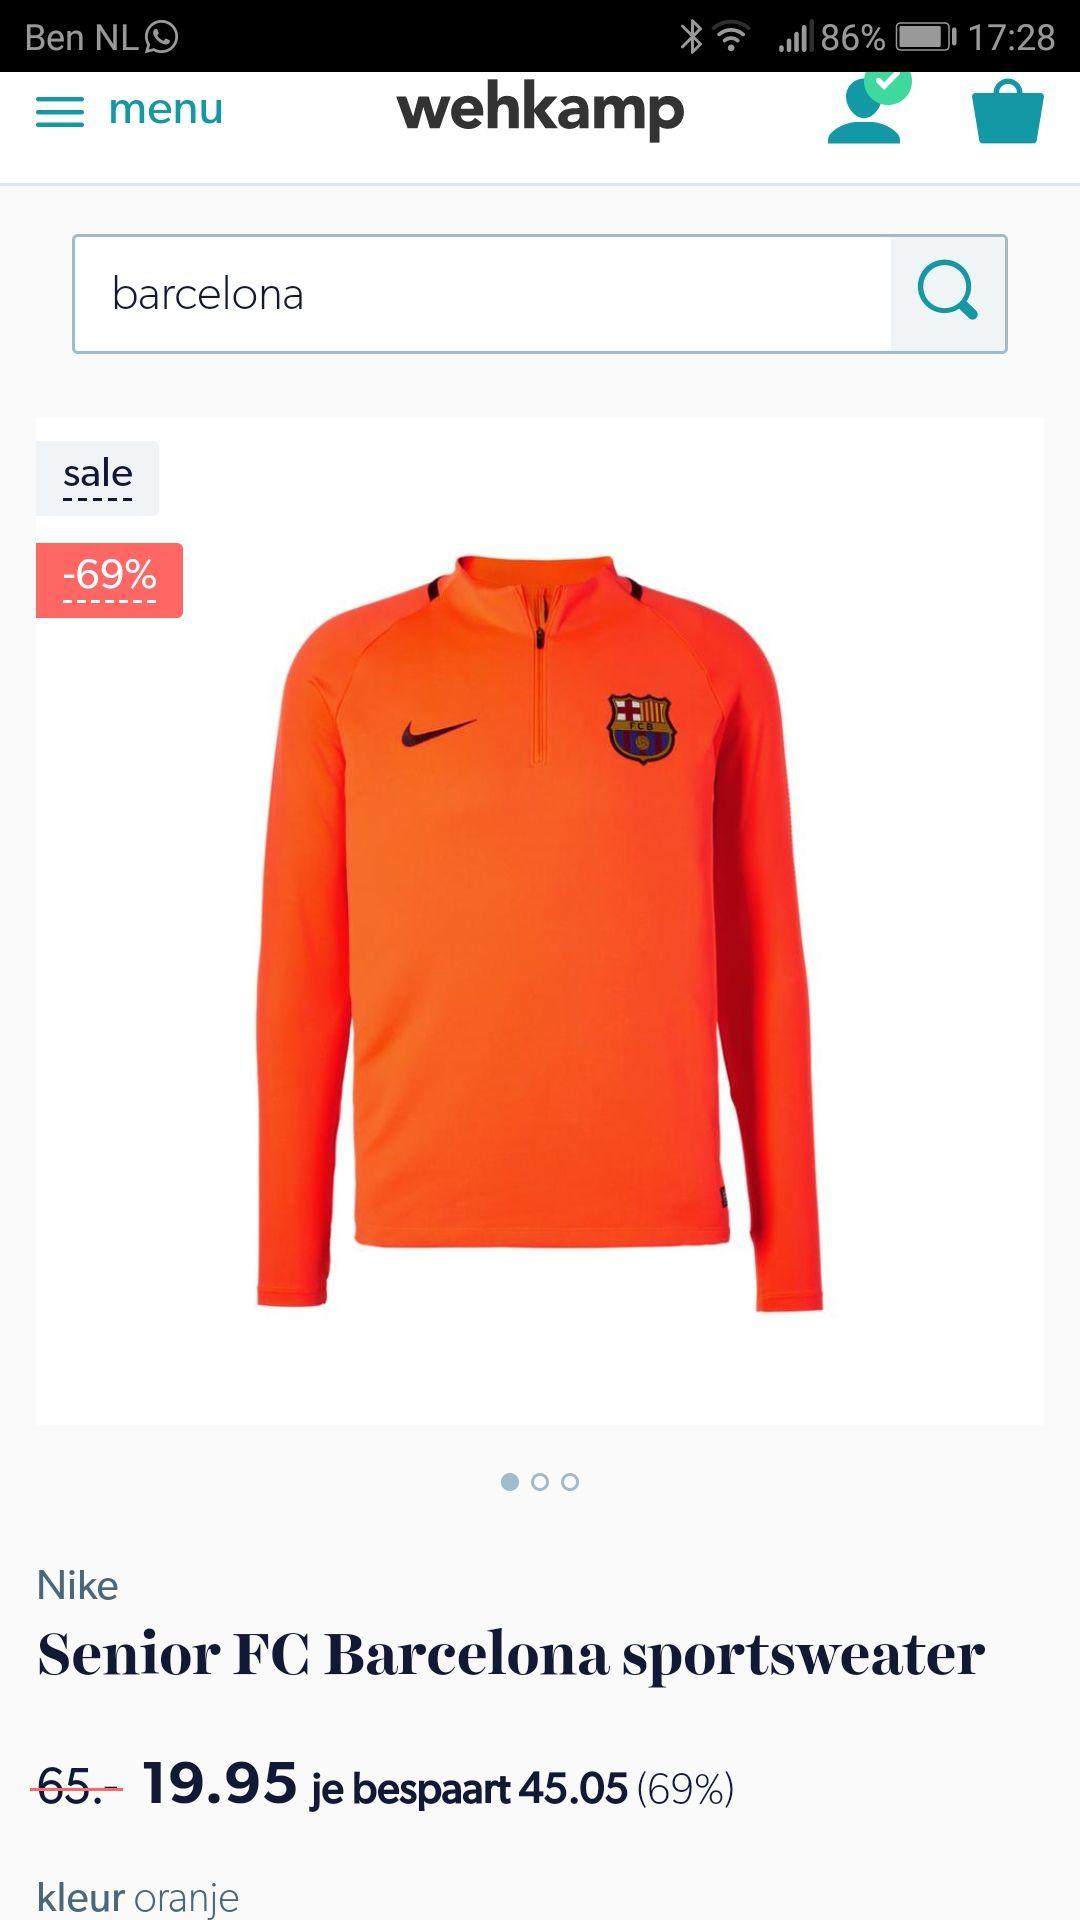 F.c Barcelona sweater